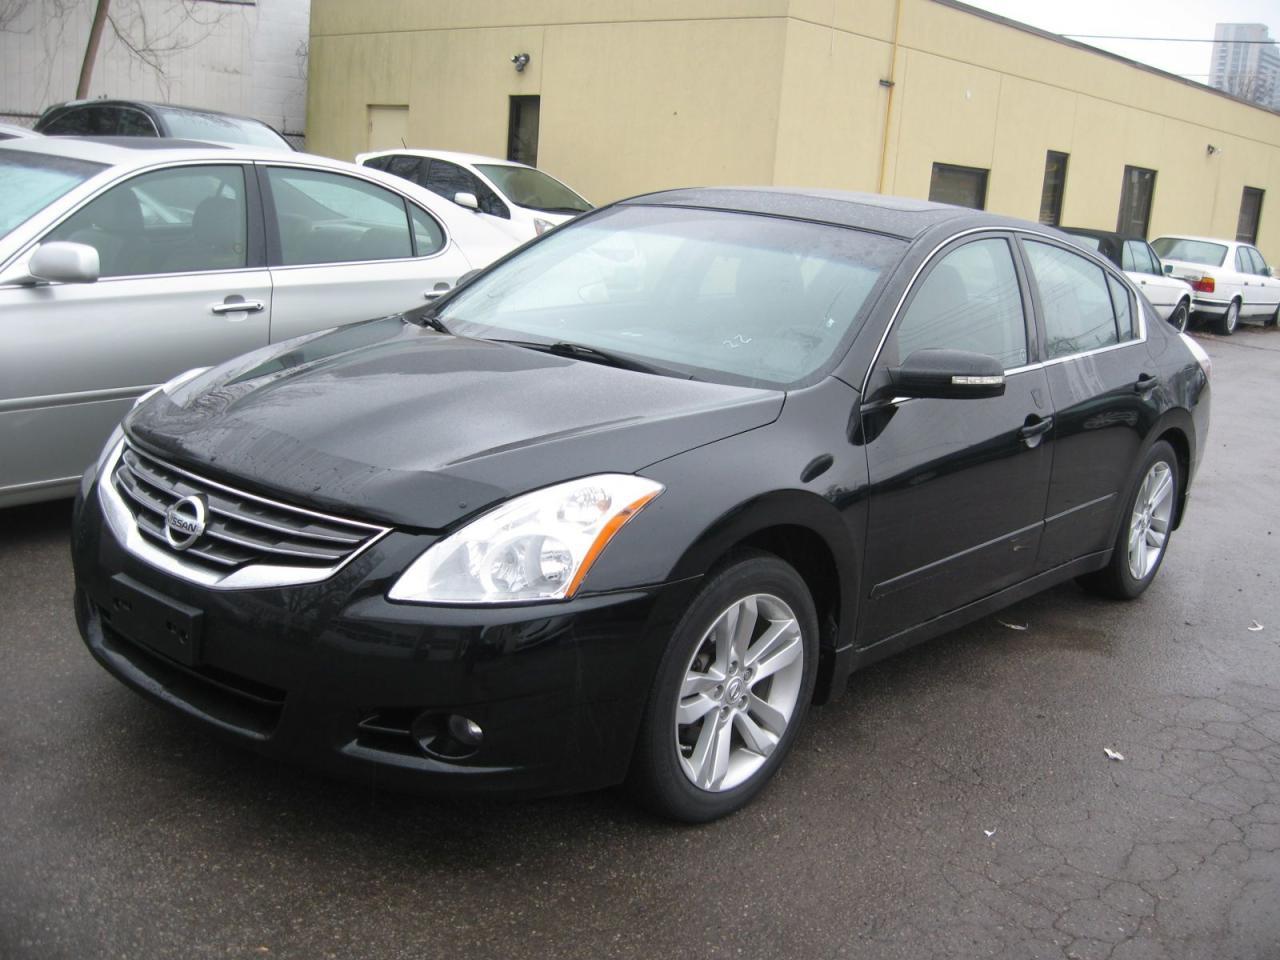 Photo of Black 2012 Nissan Altima